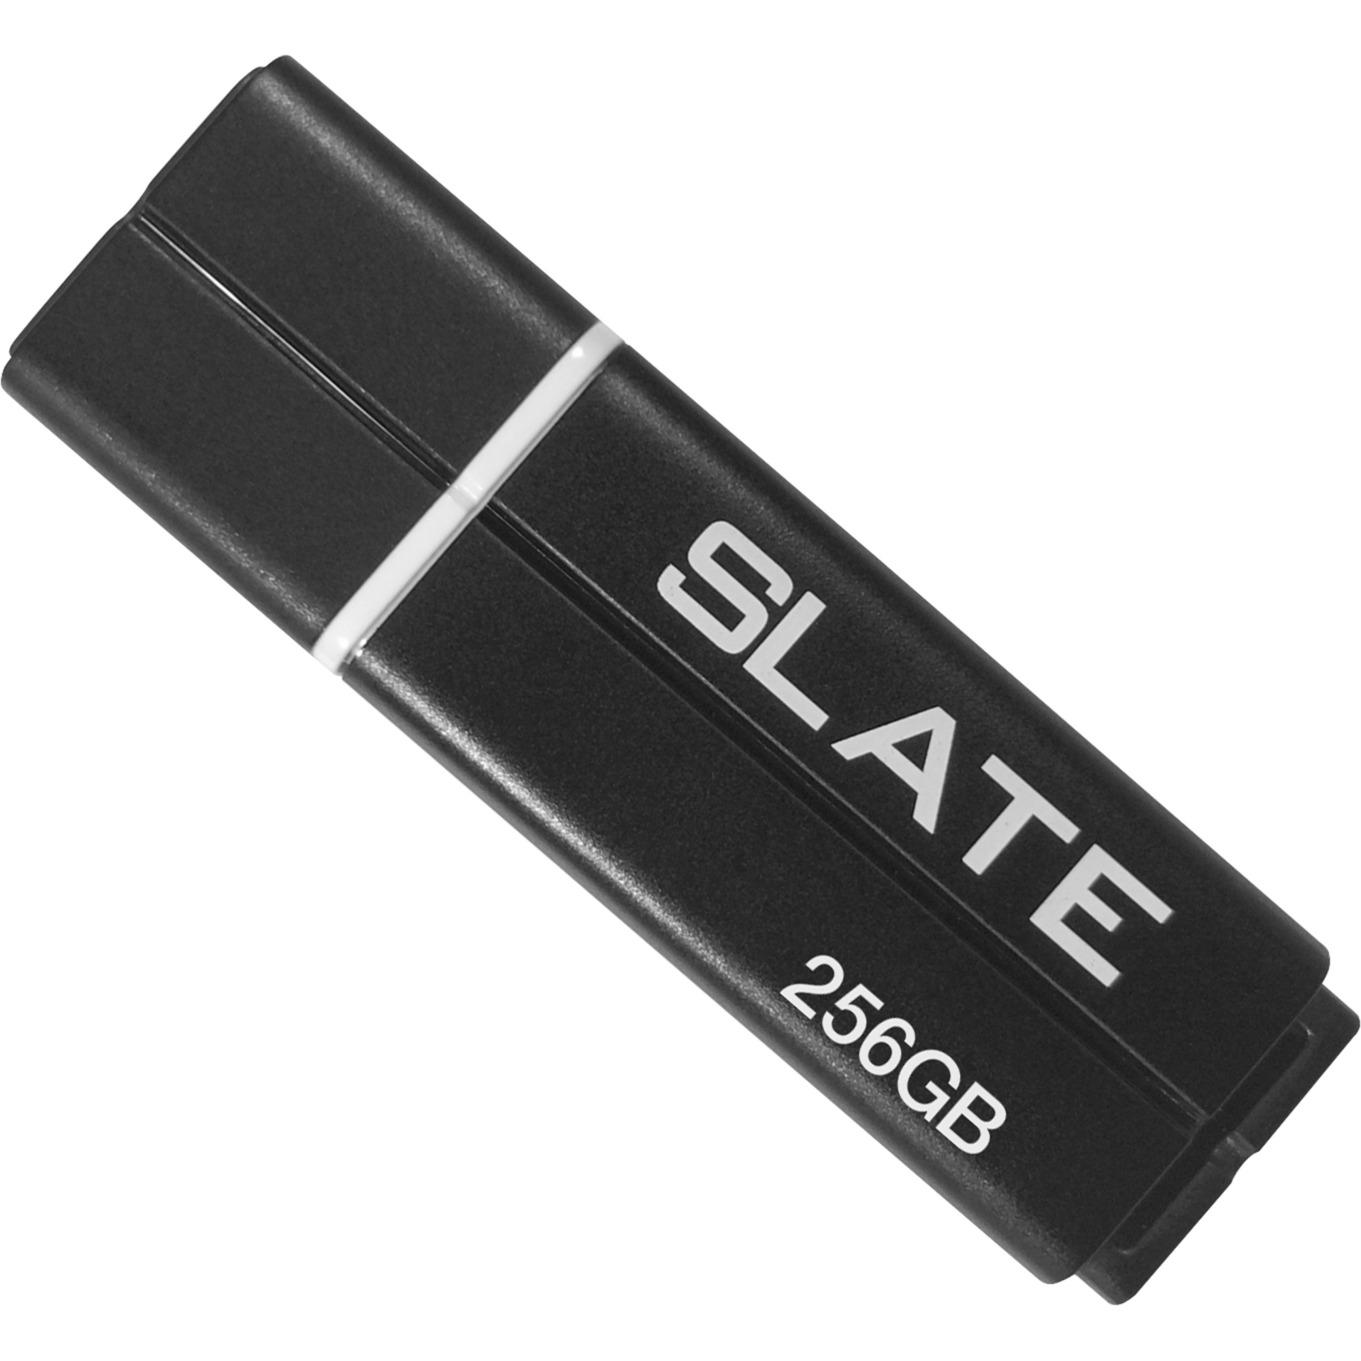 256GB 256GB USB 3.0 (3.1 Gen 1) Conector USB Tipo A Negro unidad flash USB, Lápiz USB